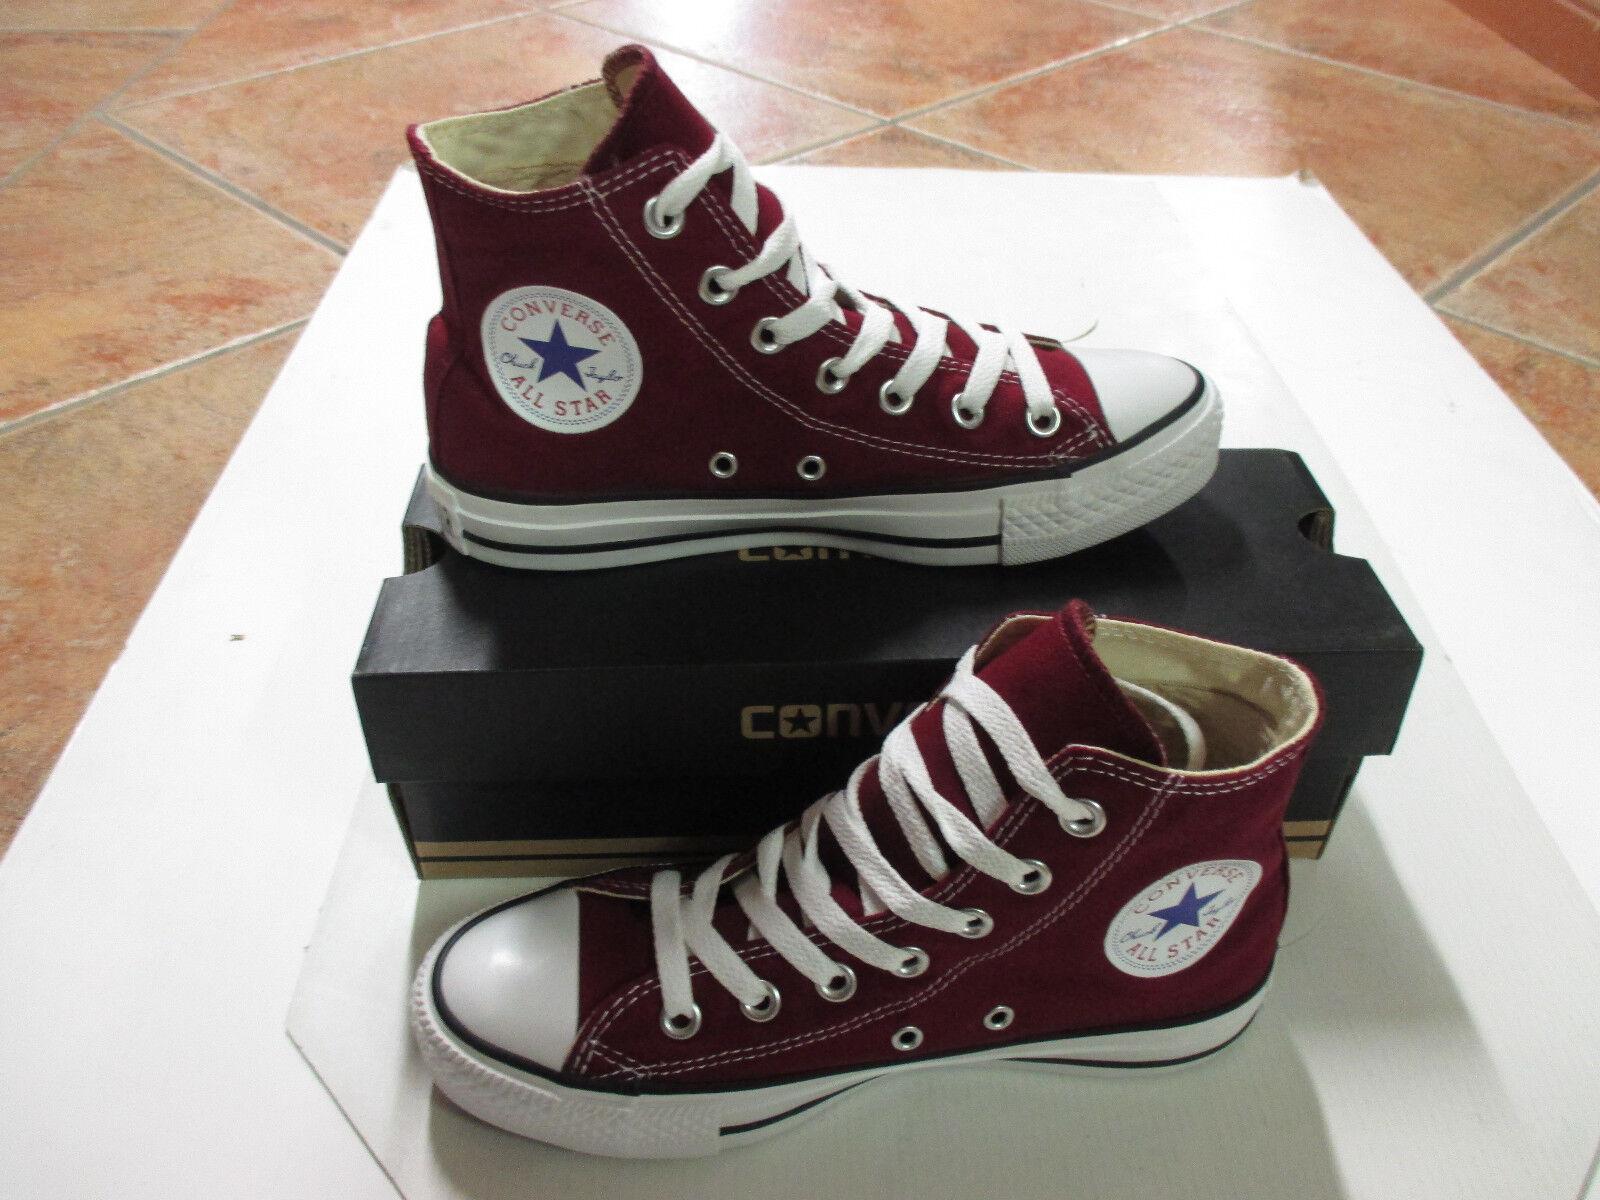 Converse Chucks All Star HI Größe 36 Maroon weinrot M9613C Turnschuhe Neu